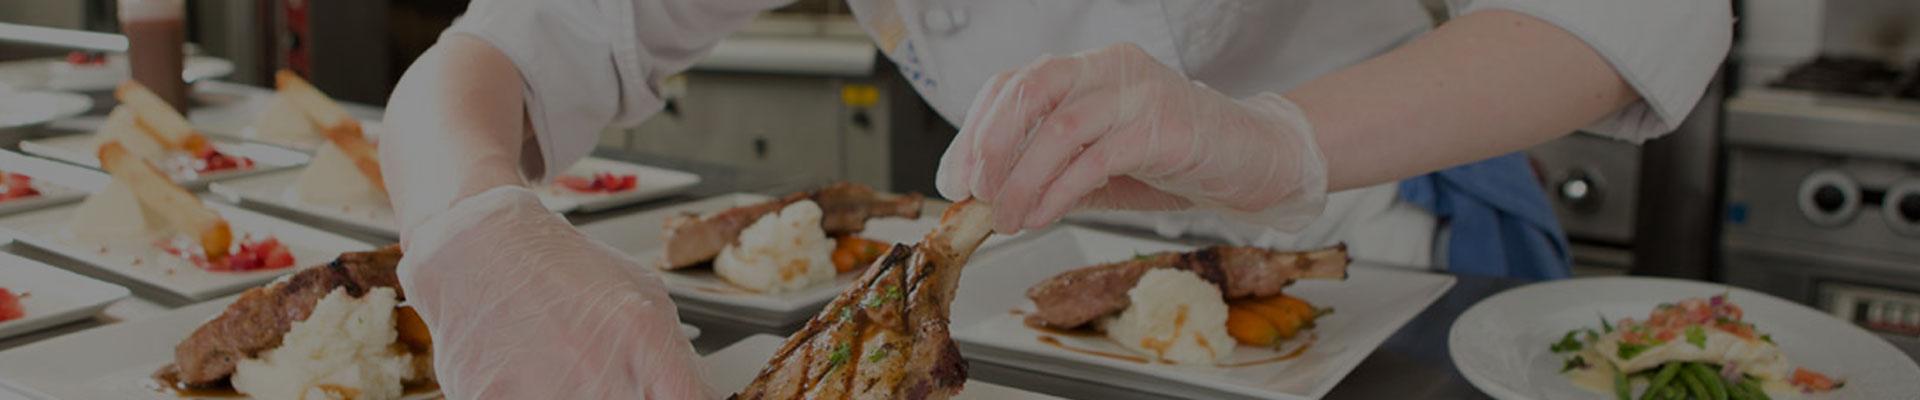 Culinary School Dubai